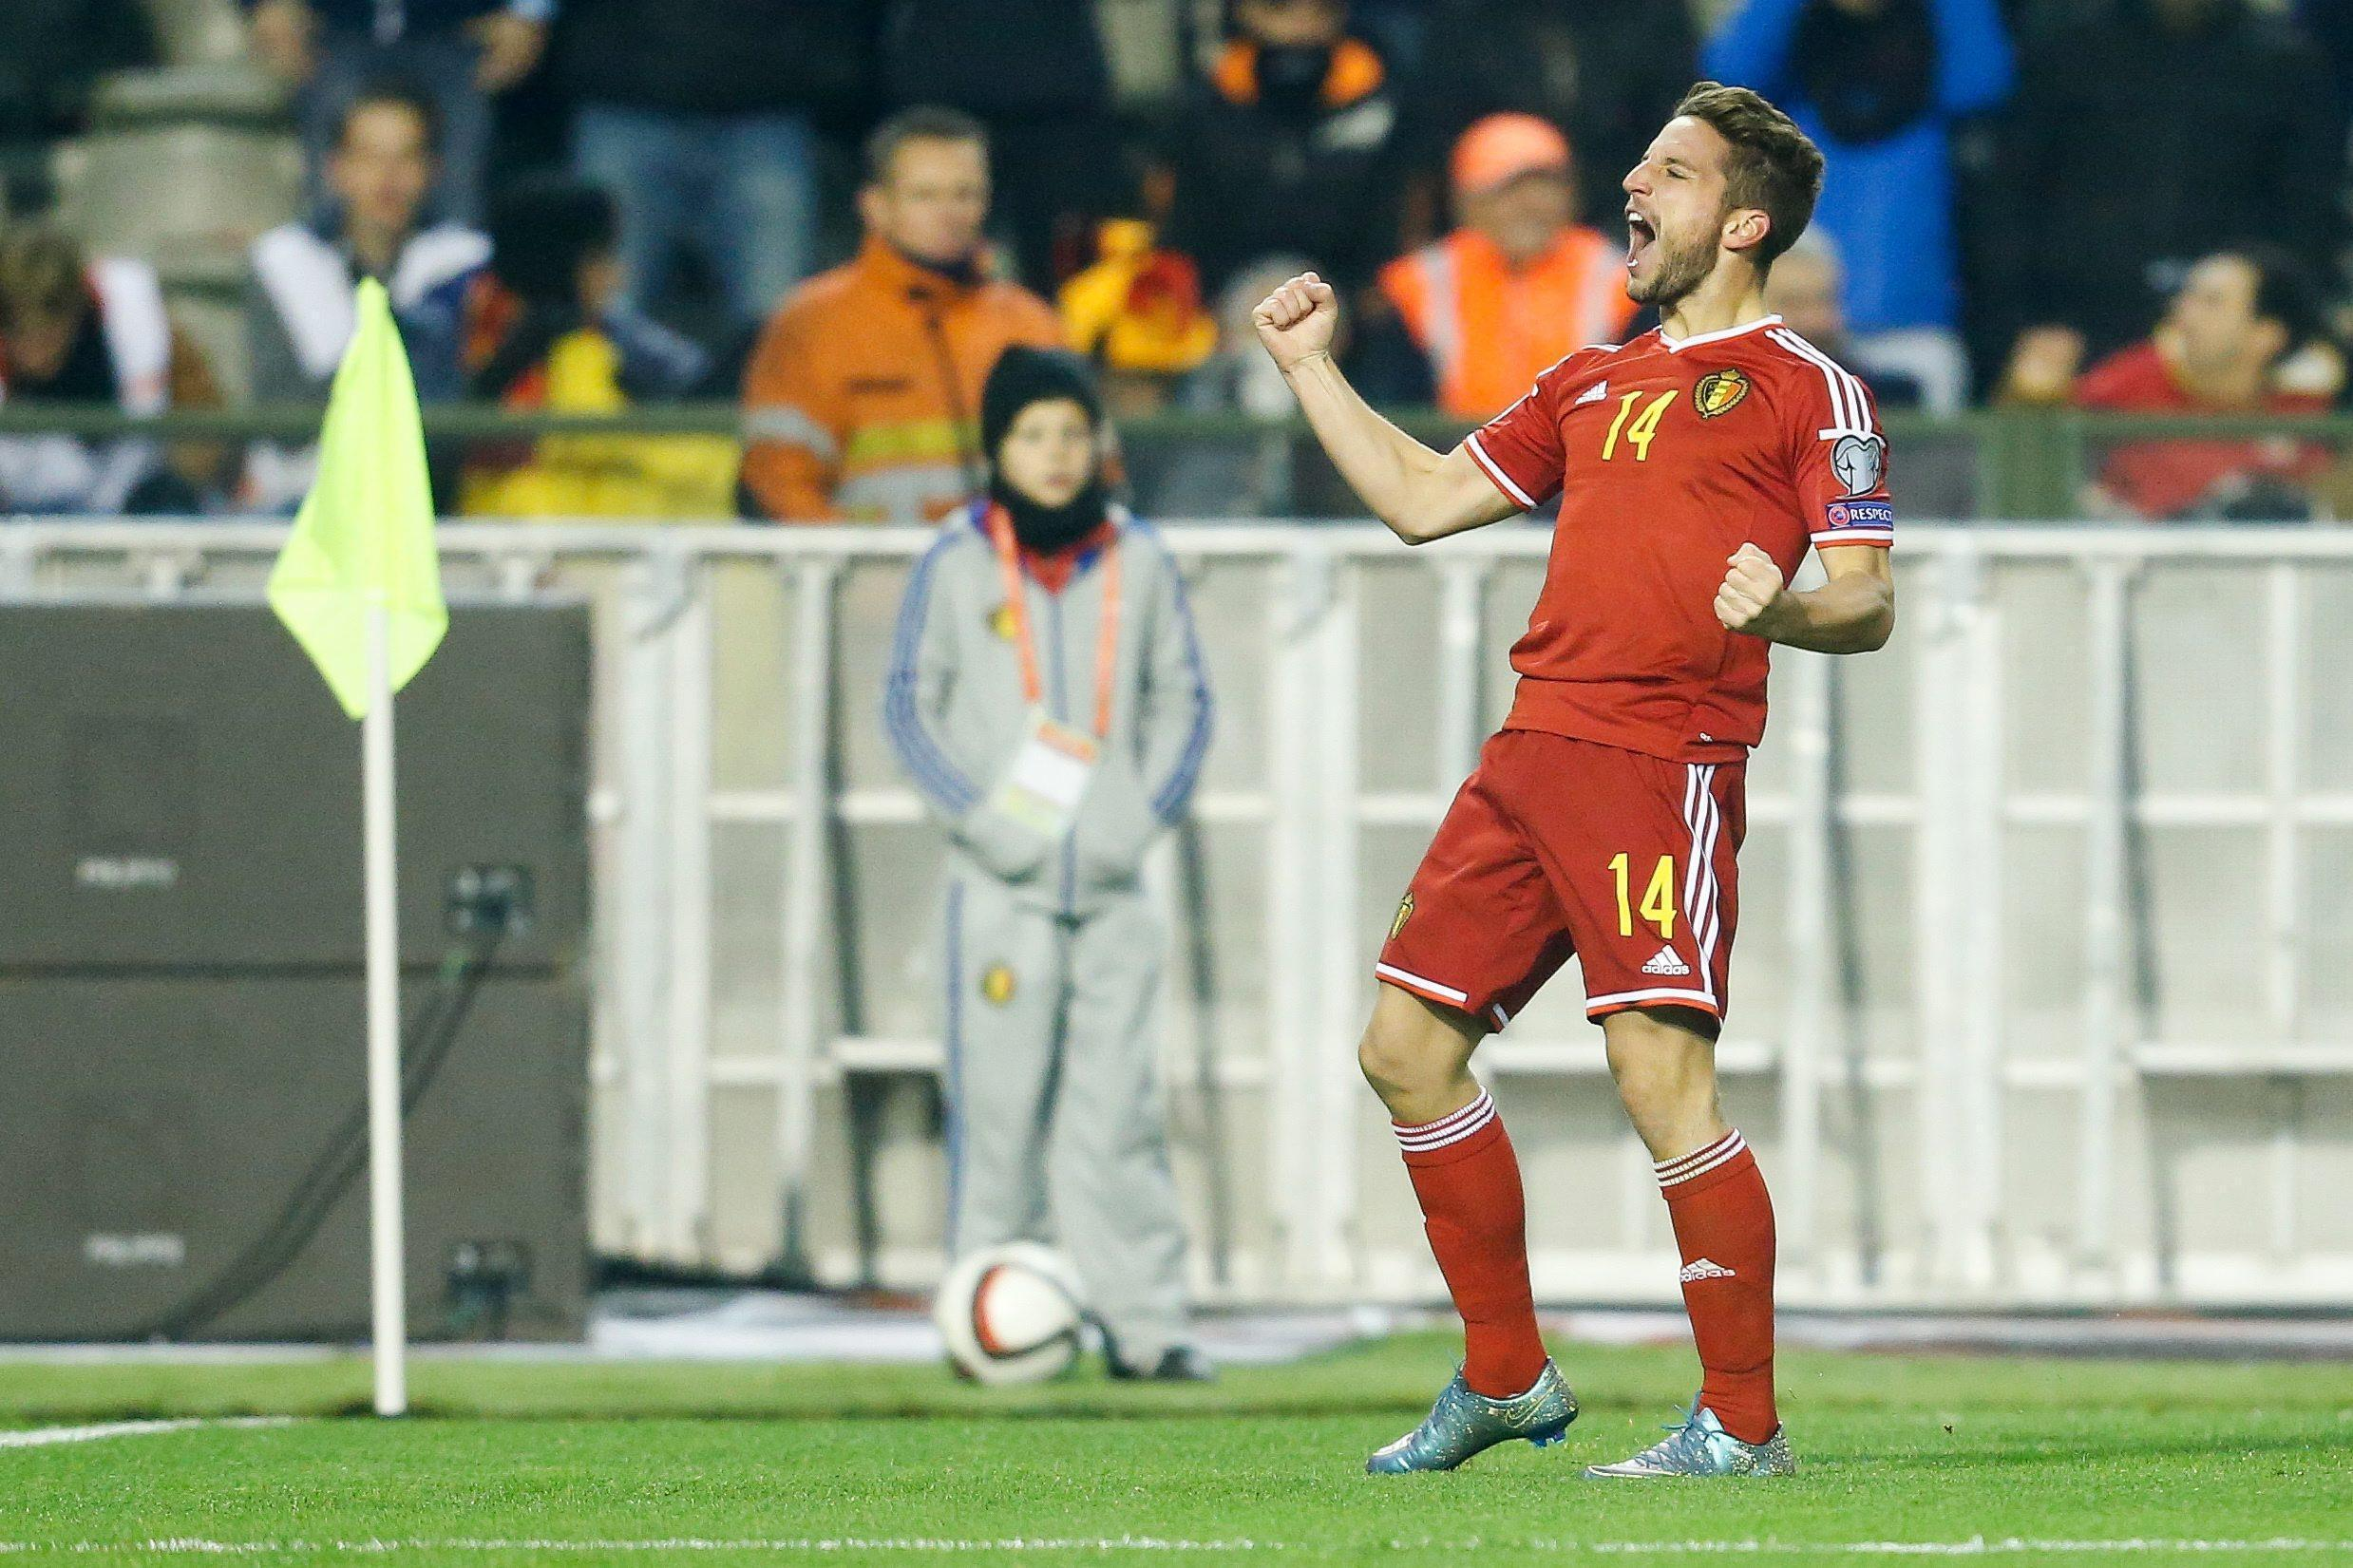 Belgio-Israele 3-1: Dries Mertens esulta dopo il gol dell'1-0 (foto Uefa.com)